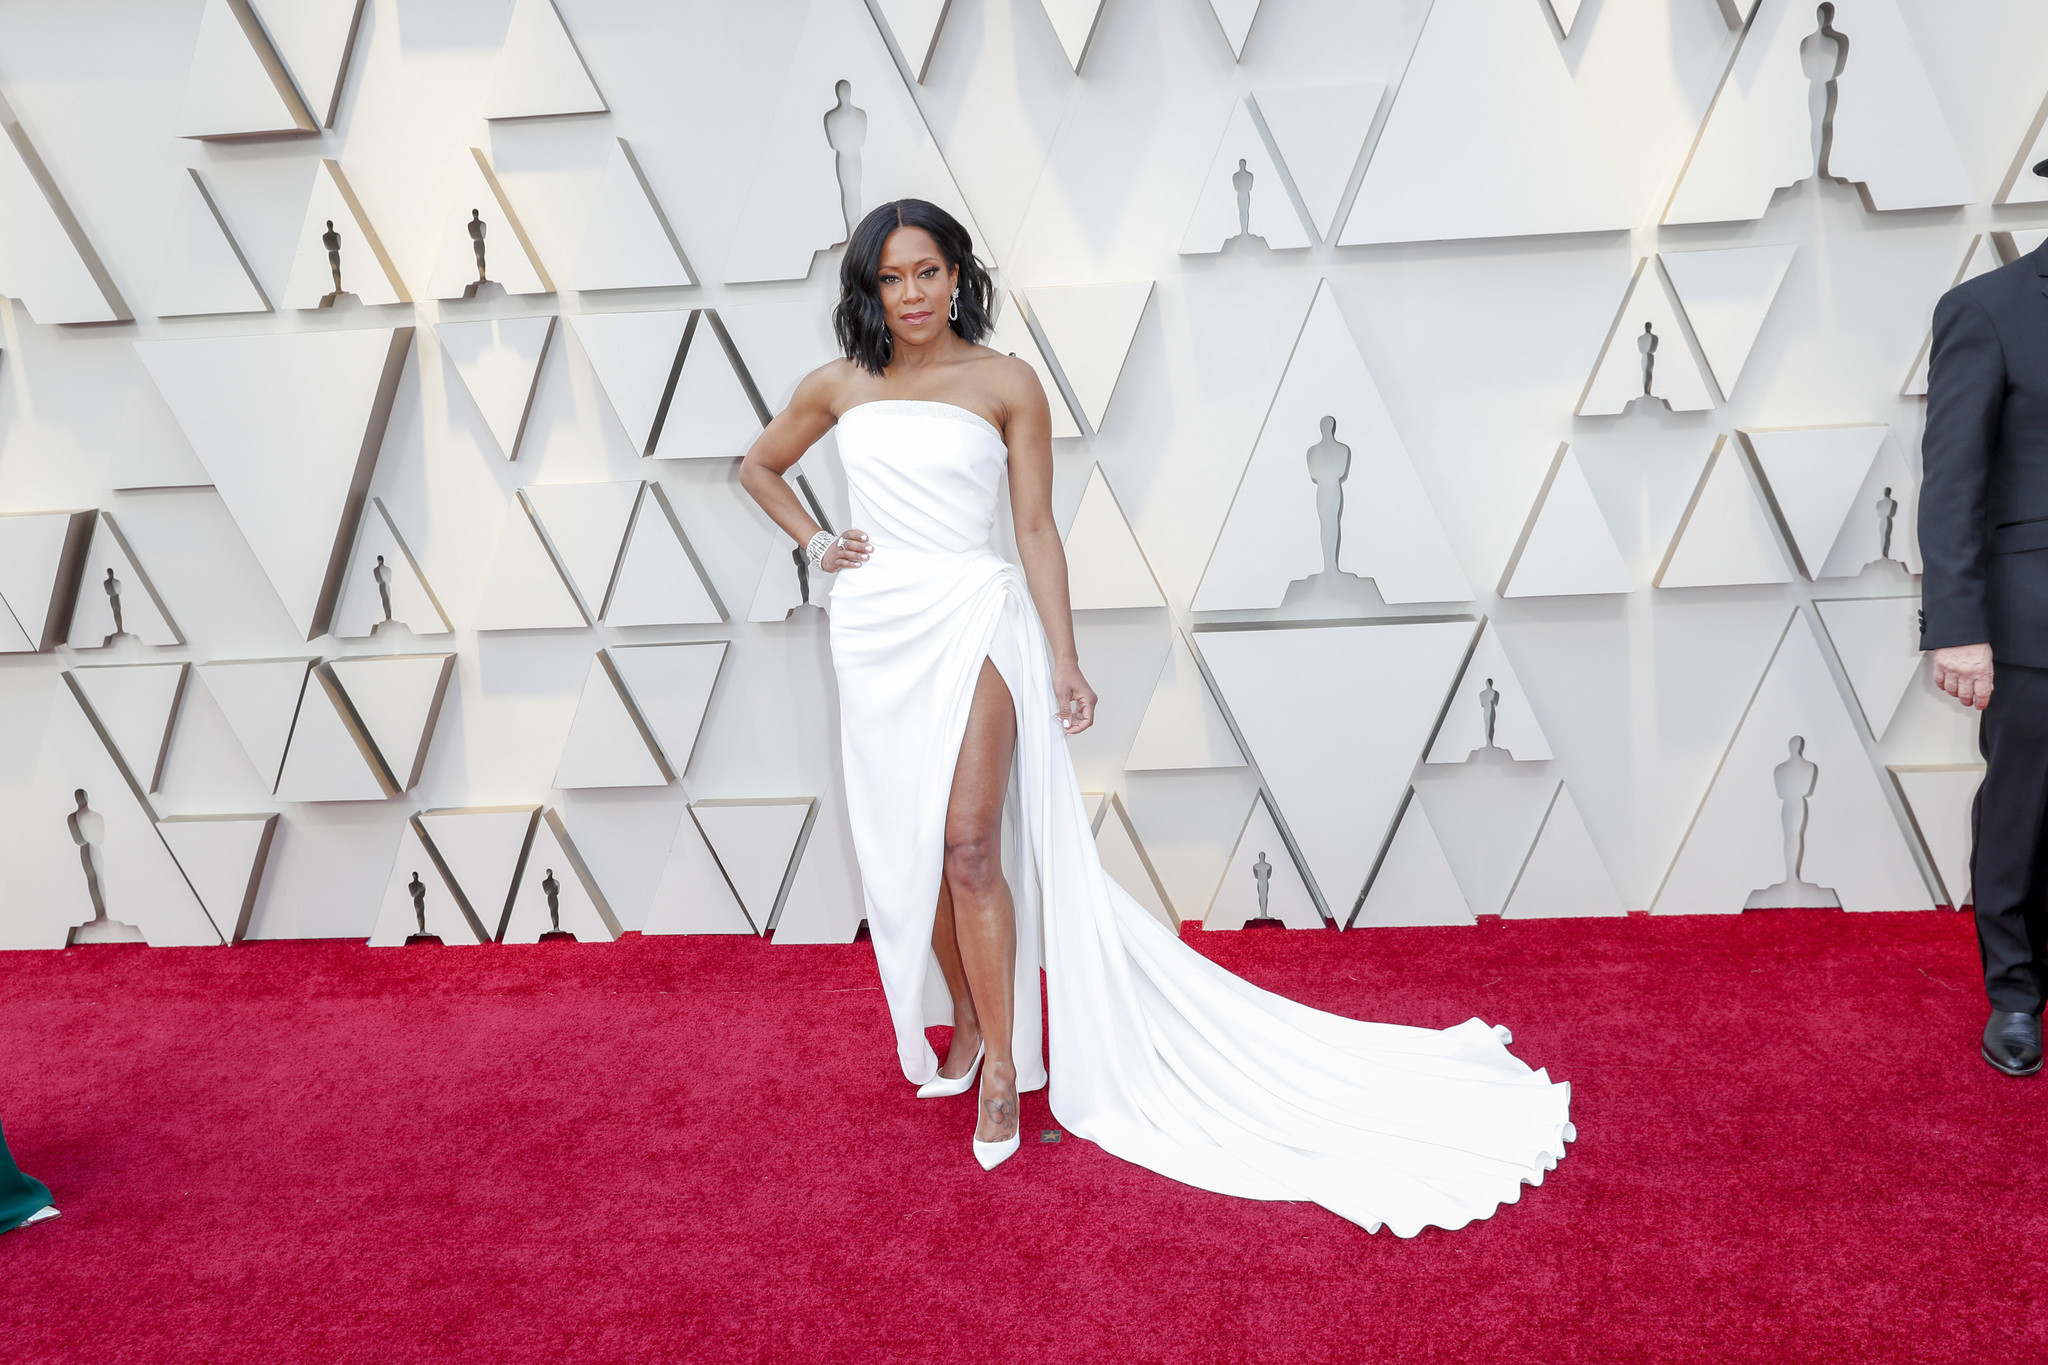 Oscars 2019: Red Carpet Arrivals - Sun Sentinel